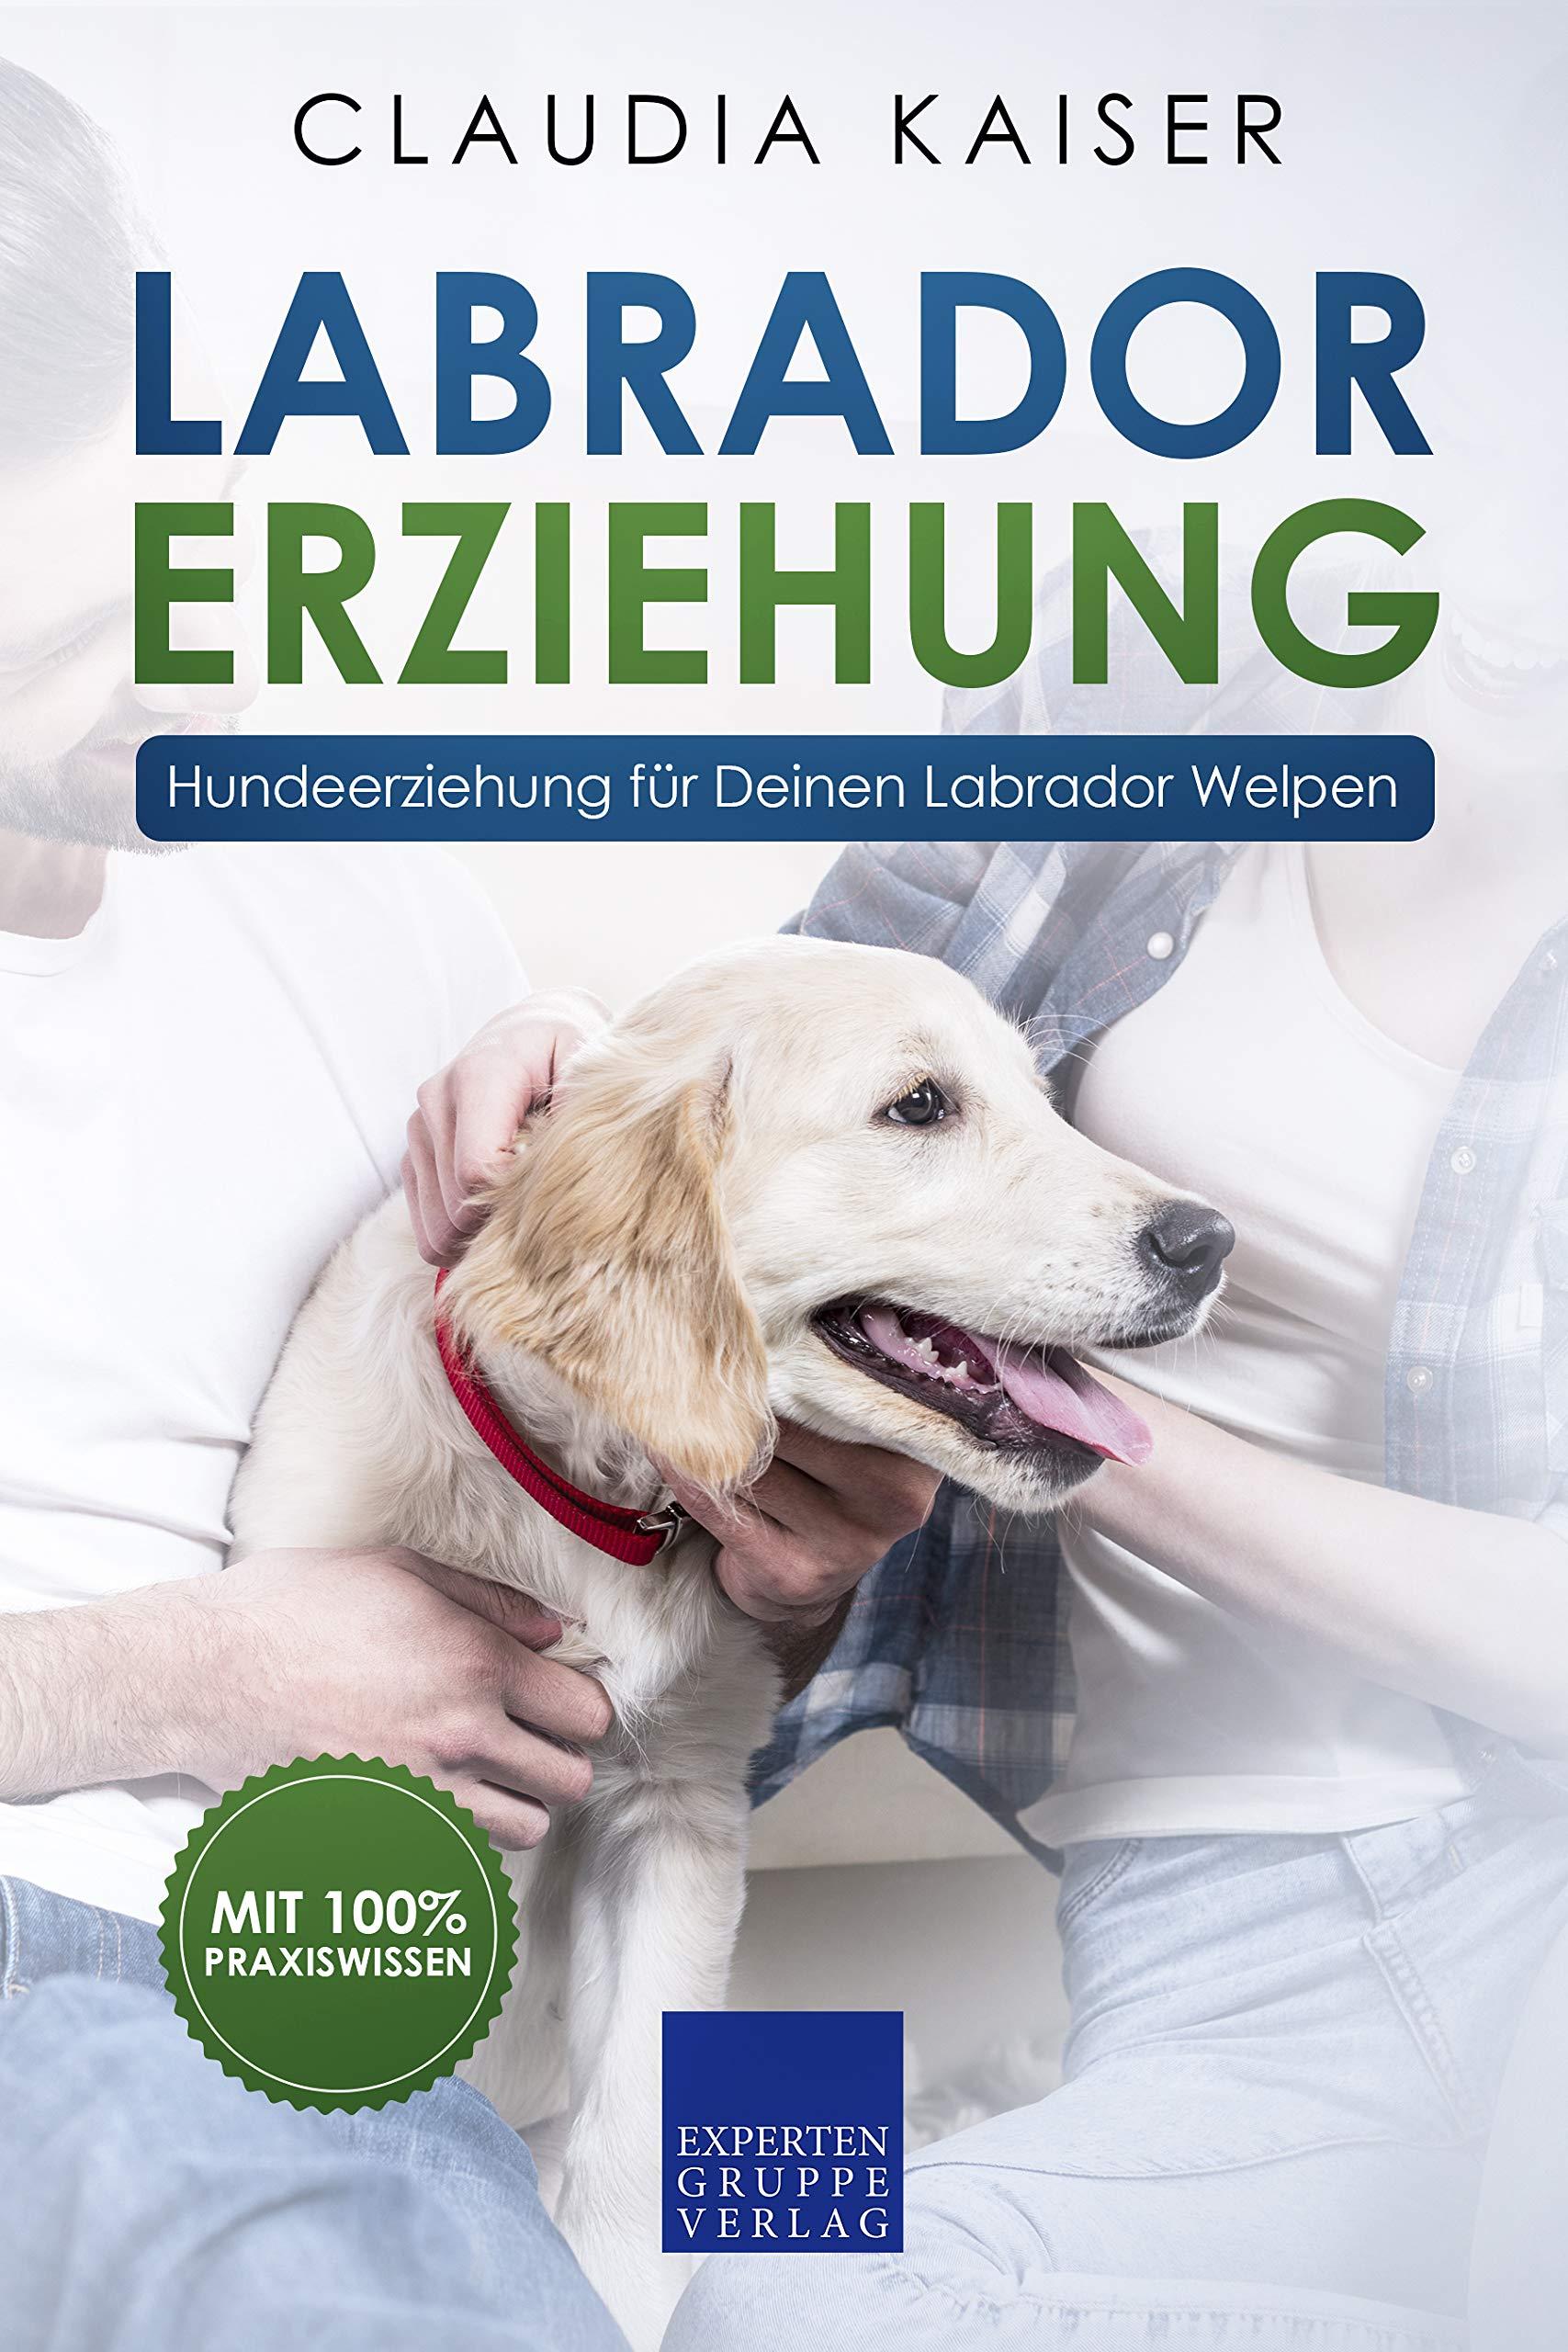 Labrador Erziehung  Hundeerziehung Für Labrador Welpen  Labrador Band 1